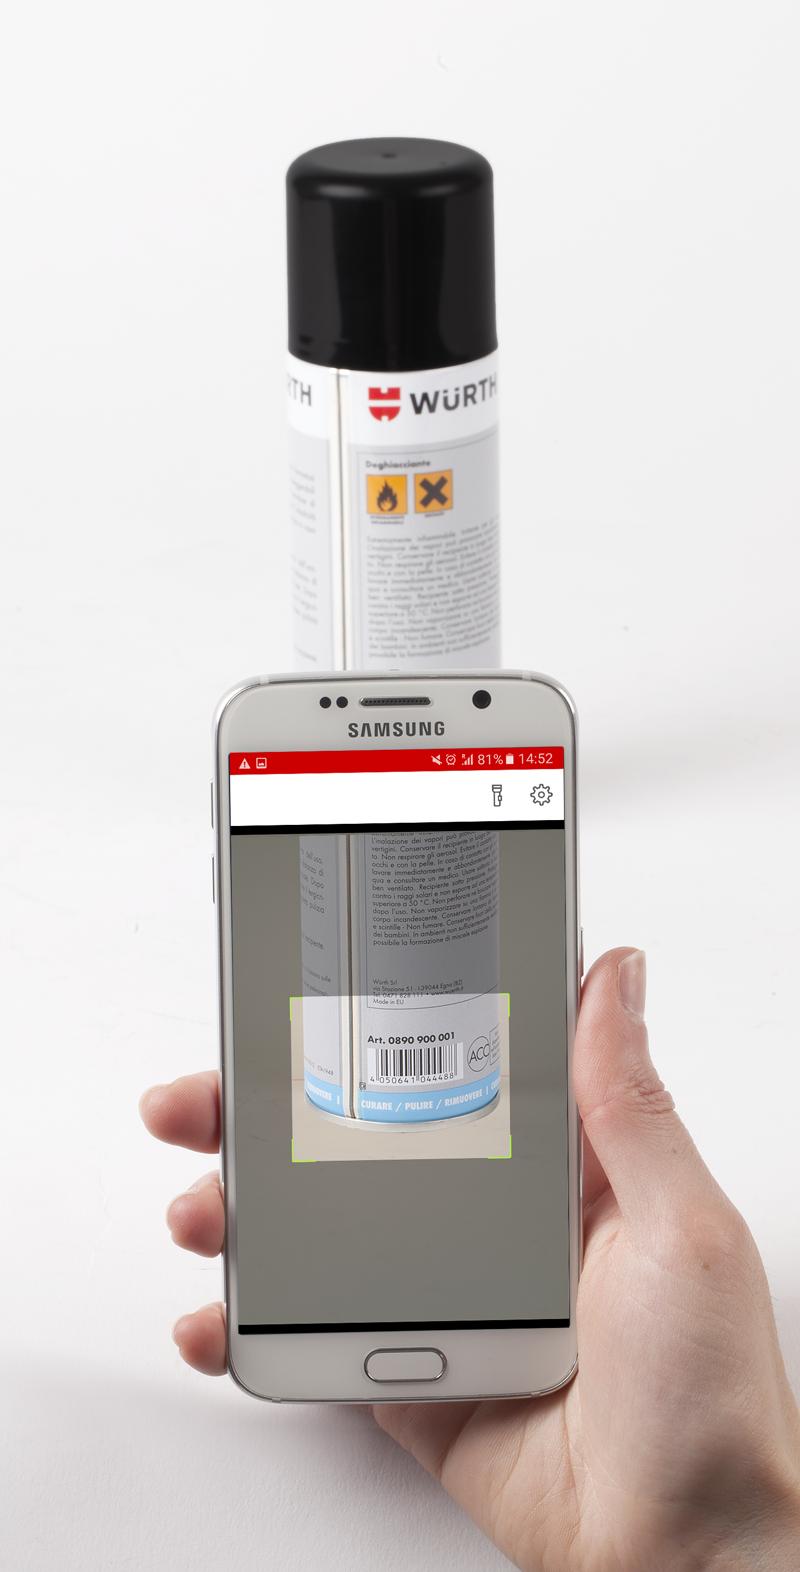 scansione wurth app